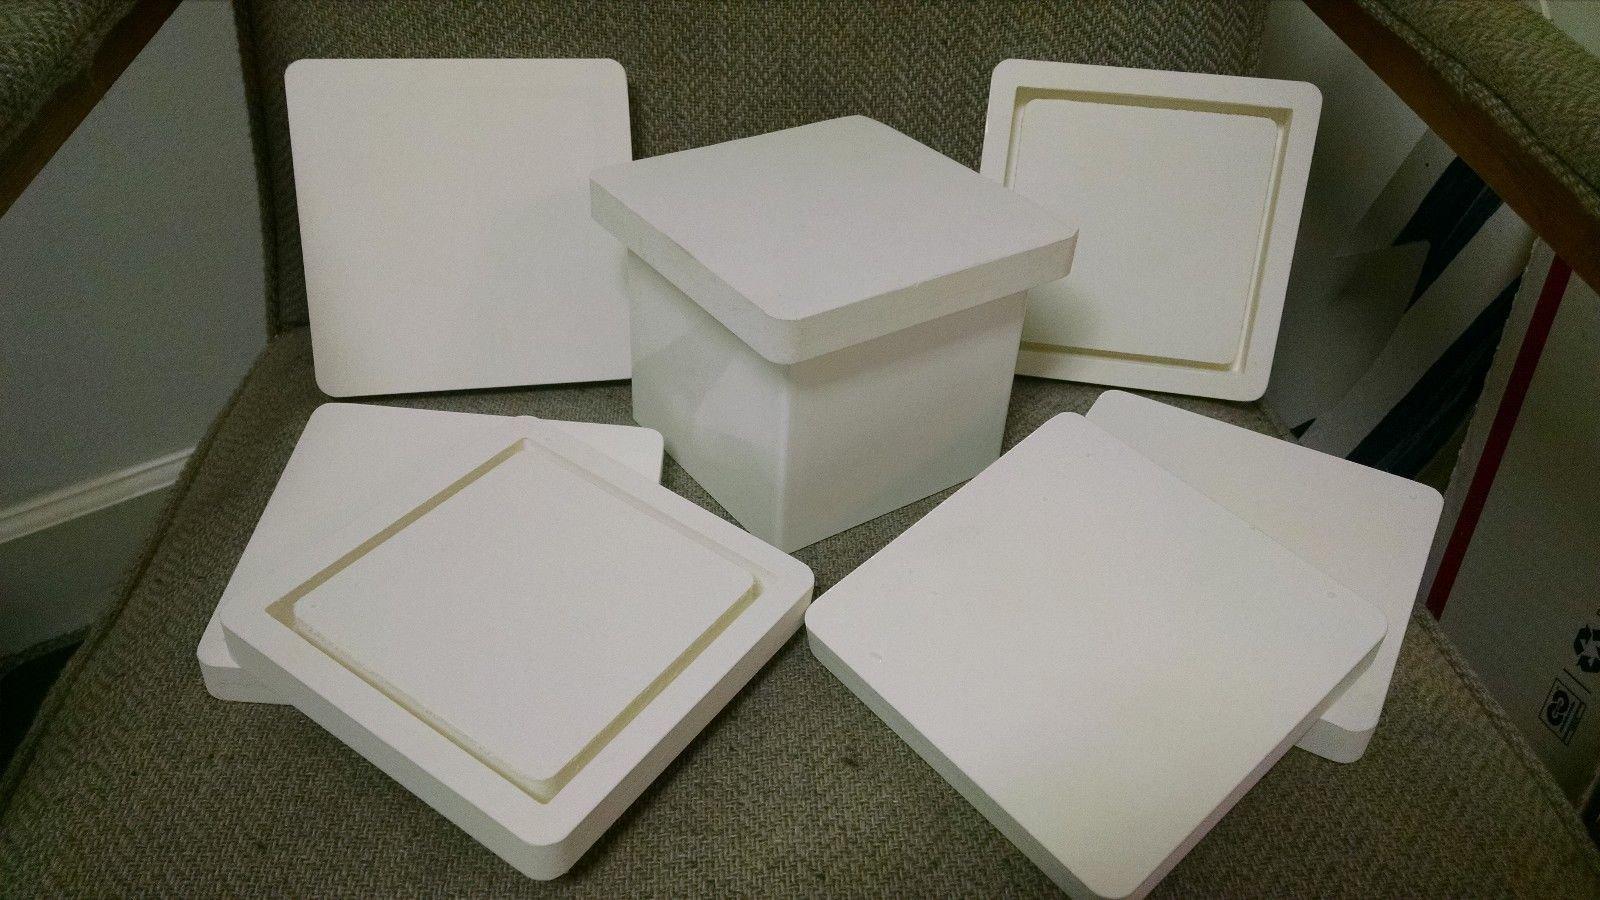 5x5 PVC POST CAP FOR BIRD OR LIGHTHOUSE MOUNT